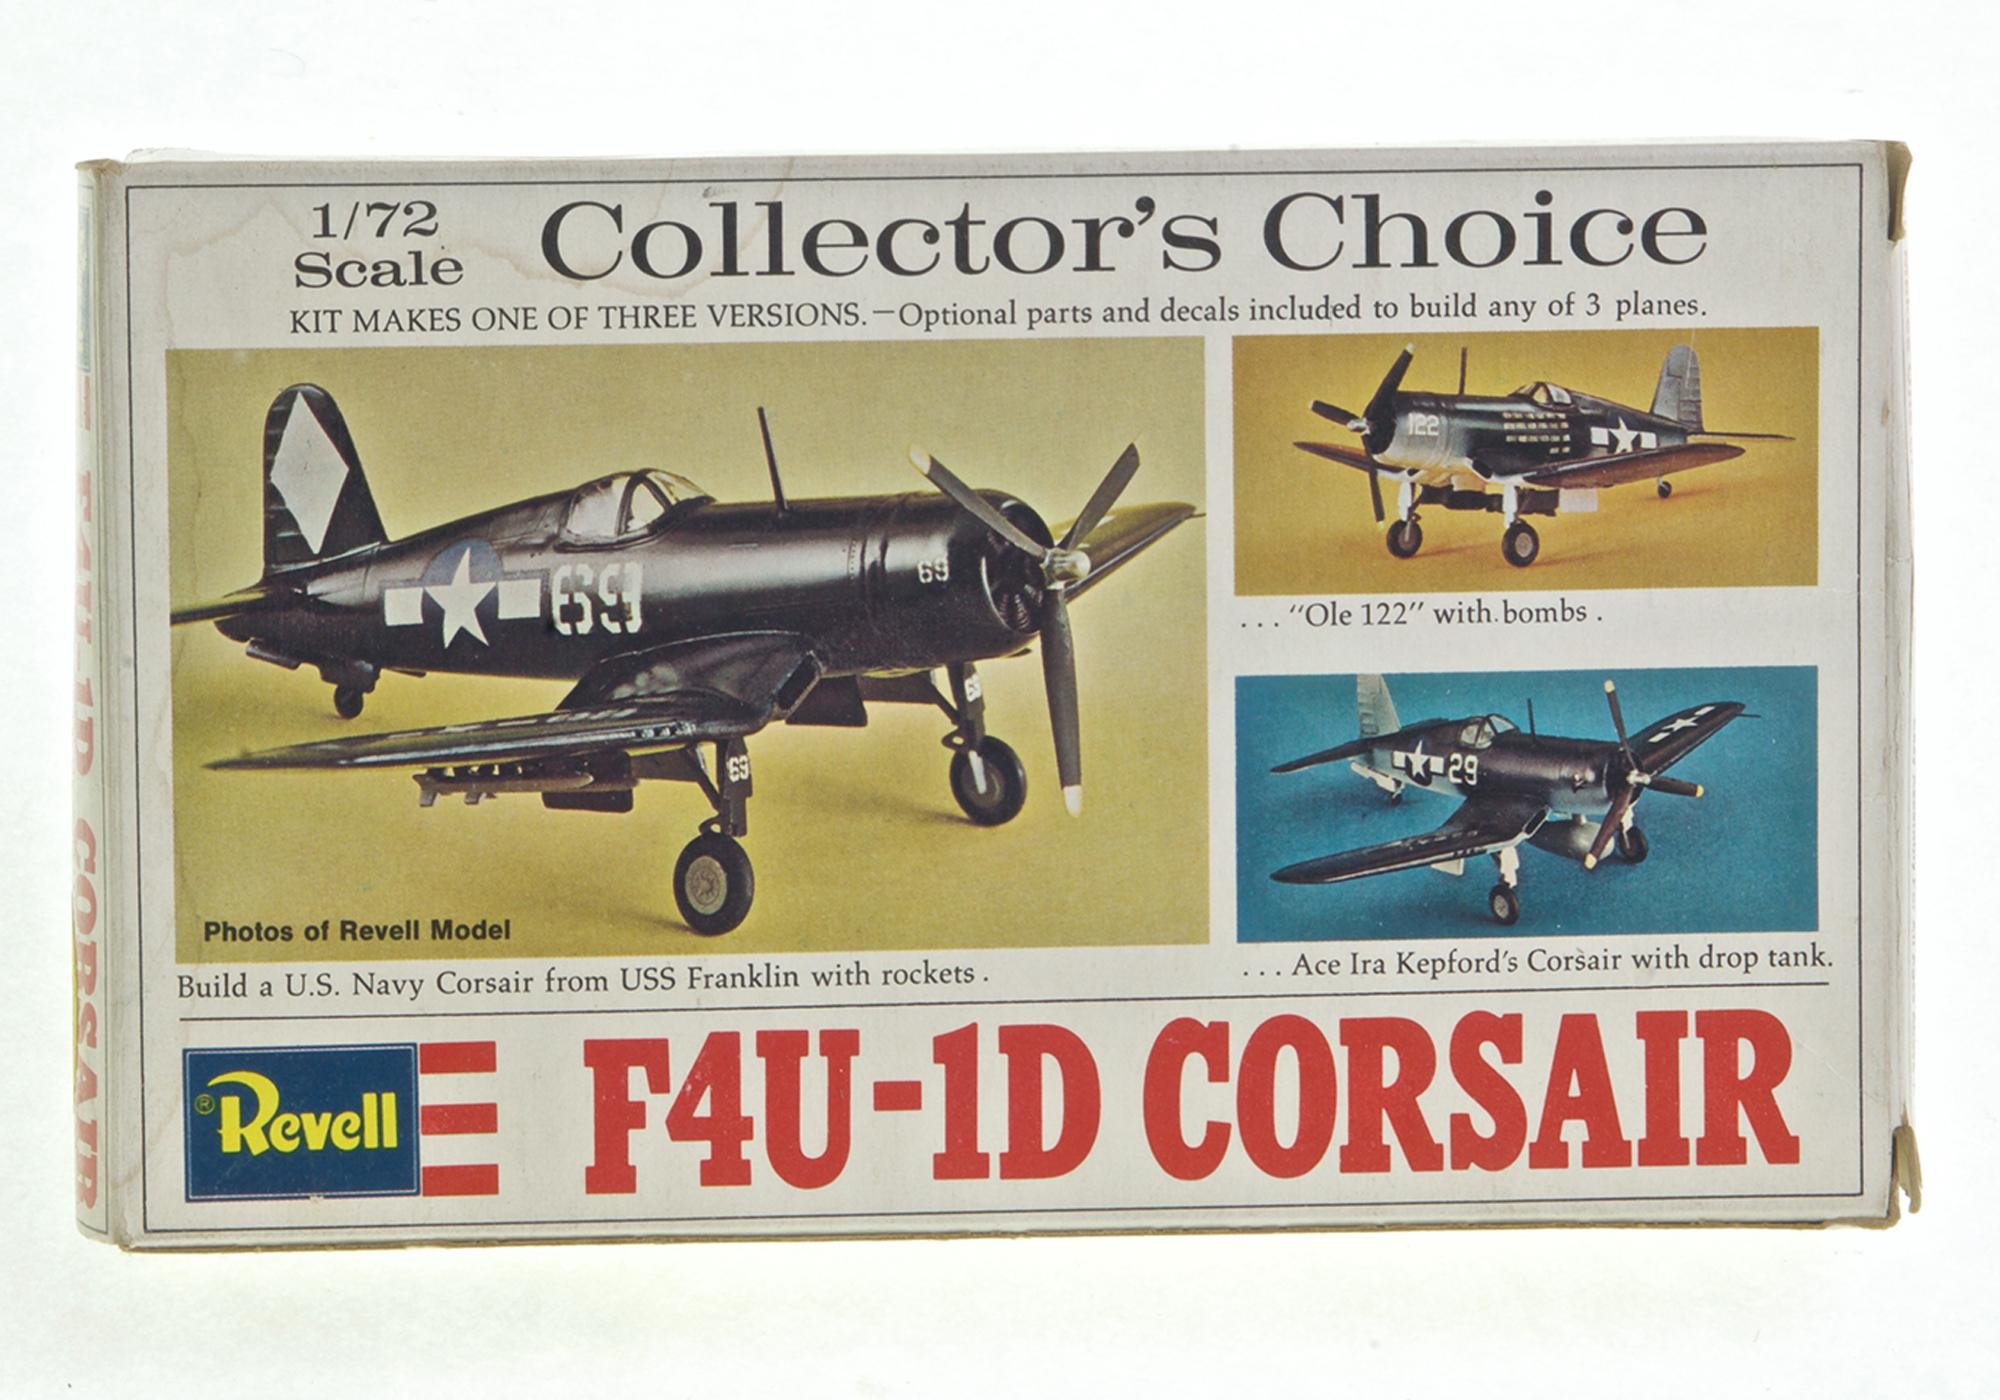 F u d corsair airfix scale recovery curios